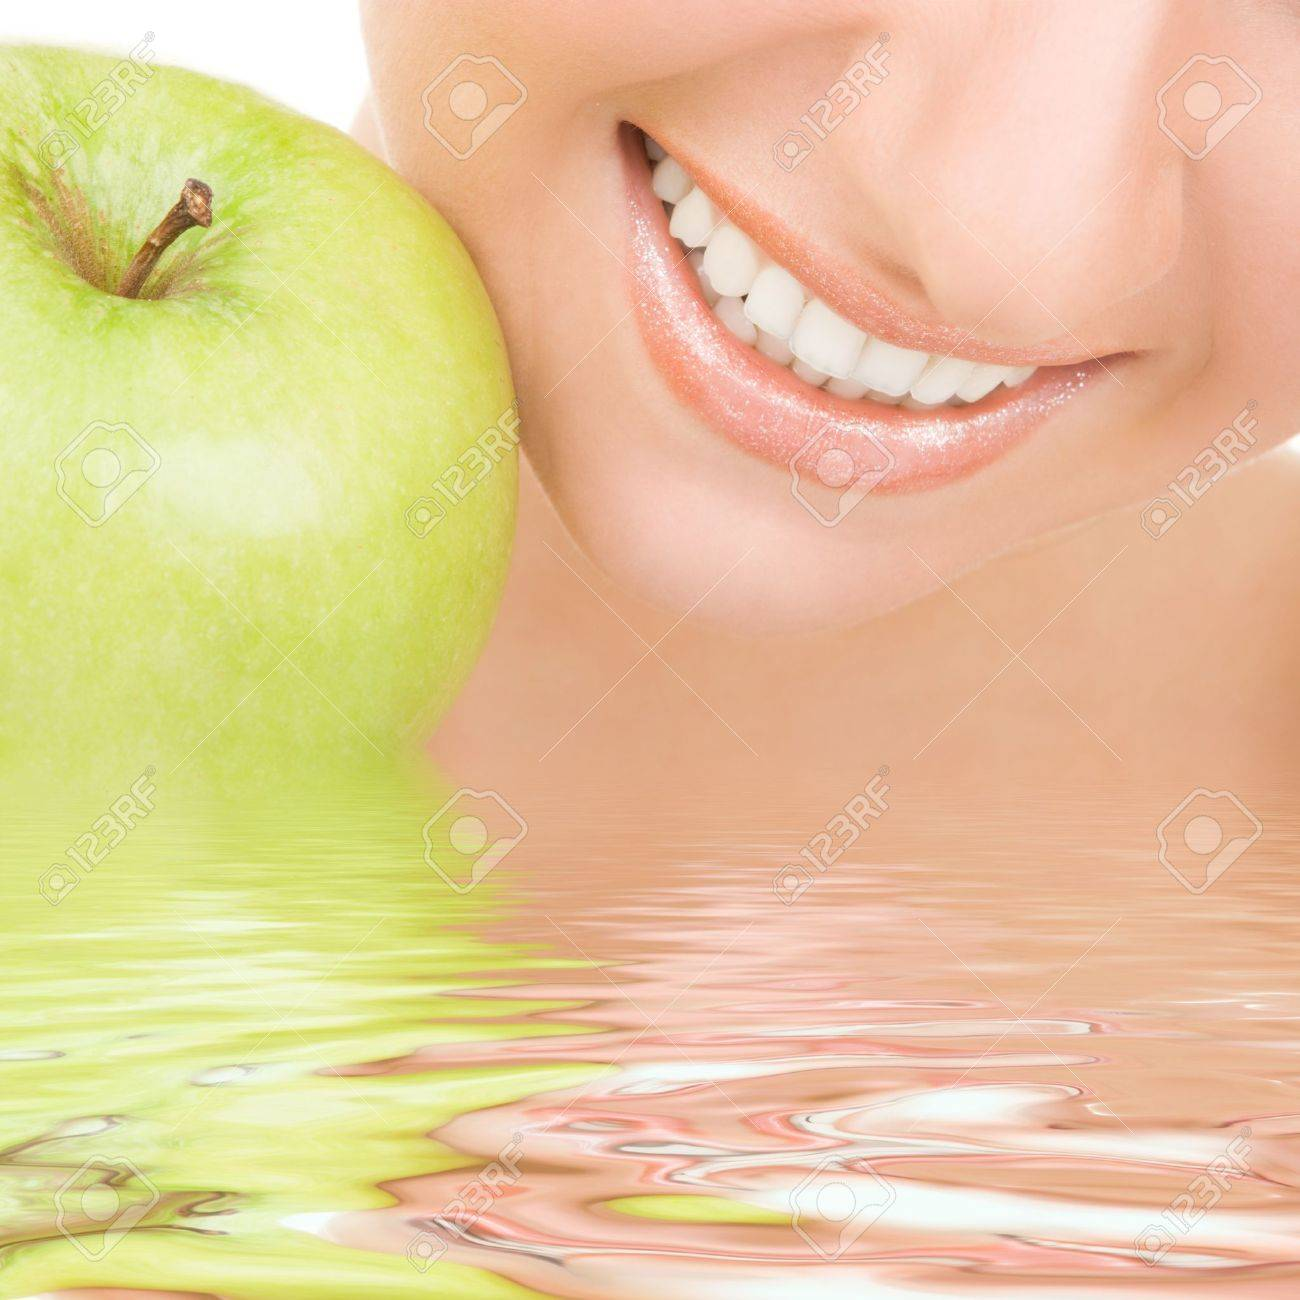 healthy teeth and green apple Stock Photo - 9112011